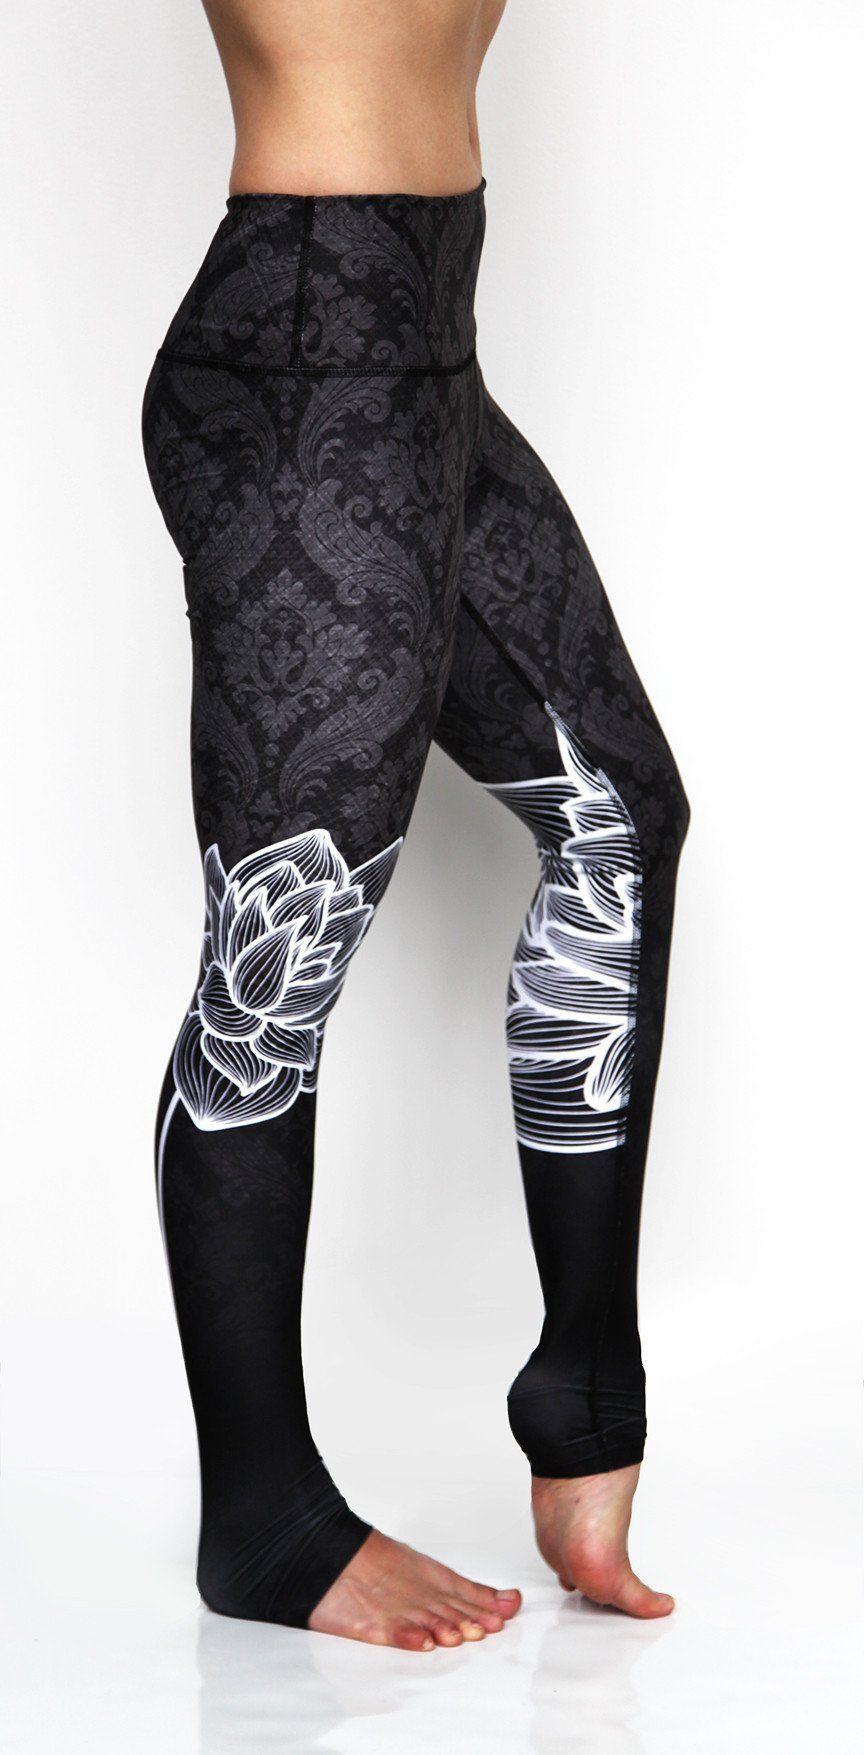 d1636ecc71 Yoga Pants | Green Manufacturing | Eco Friendly | Ultra Comfortable Workout  Attire | Cute Athletic Clothing | Black Lotus | Premium Activewear